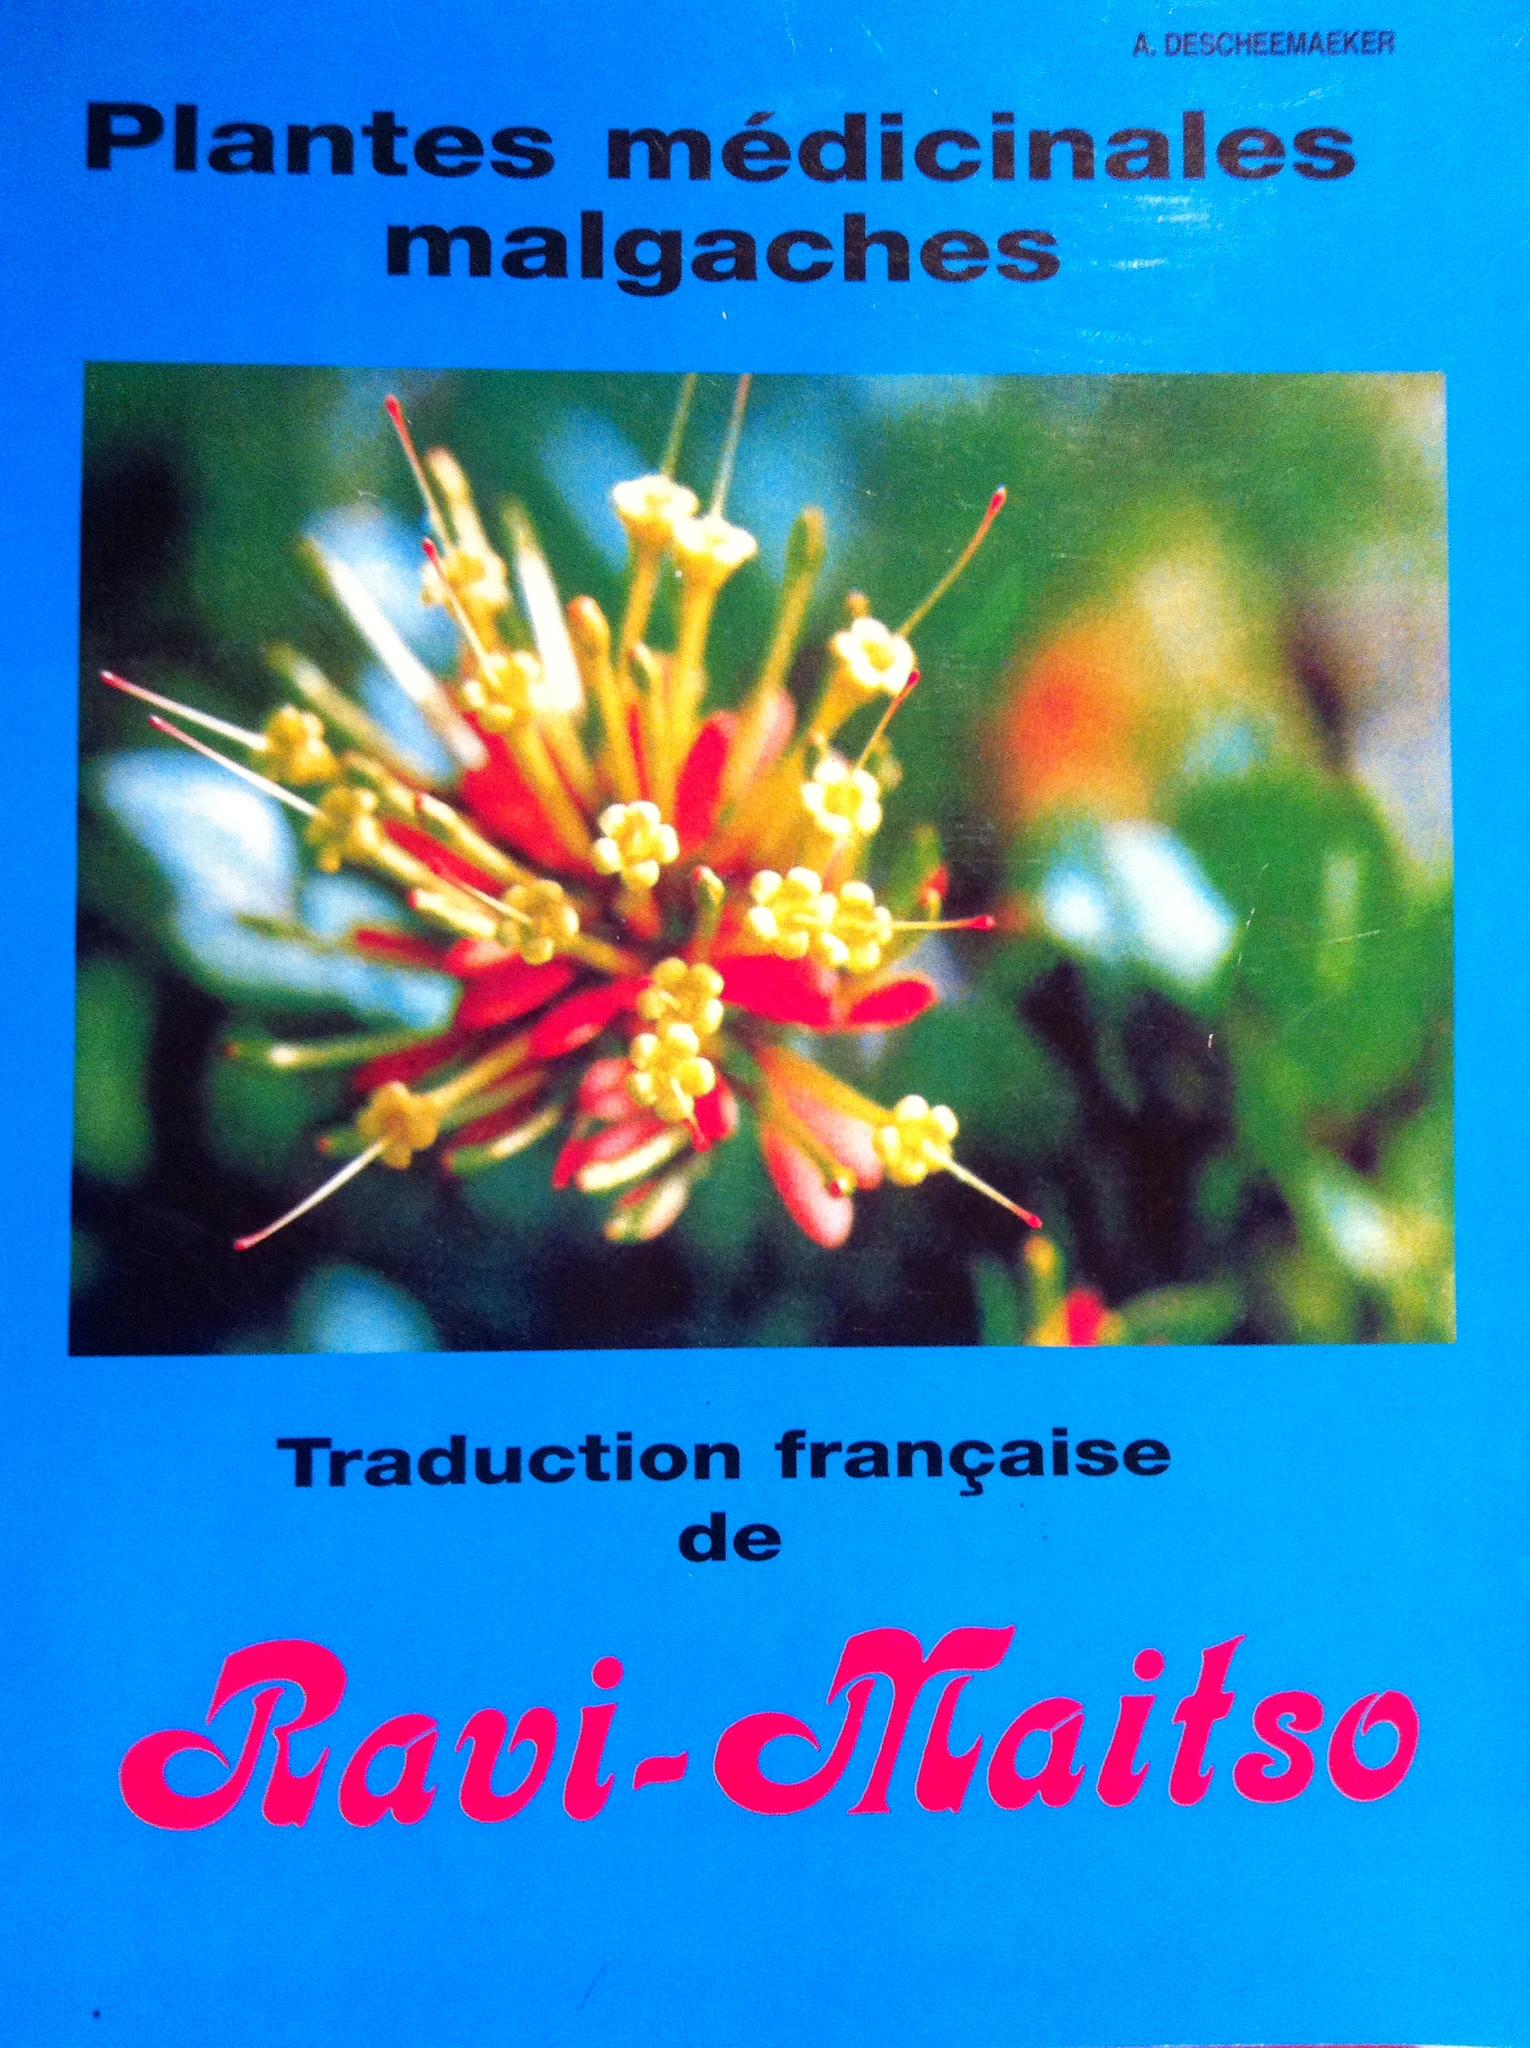 Couverture du livre Ravi-Maitso